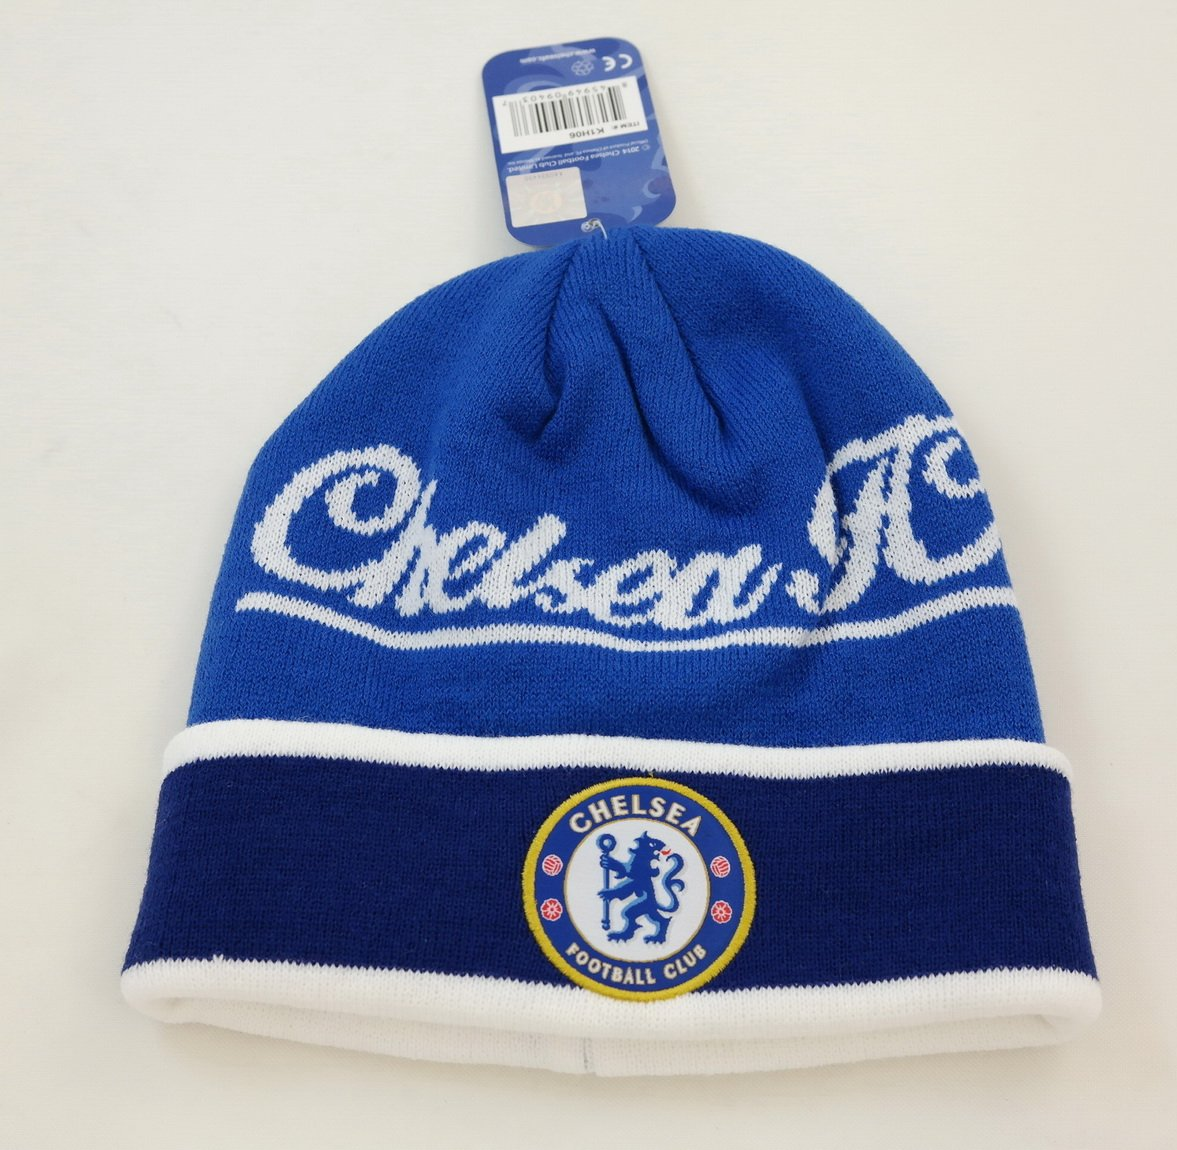 fb1d536576b Get Quotations · CHELSEA FC OFFICIAL SOCCER BEANIE KNIT FOOTBALL CLUB HAT  CAP